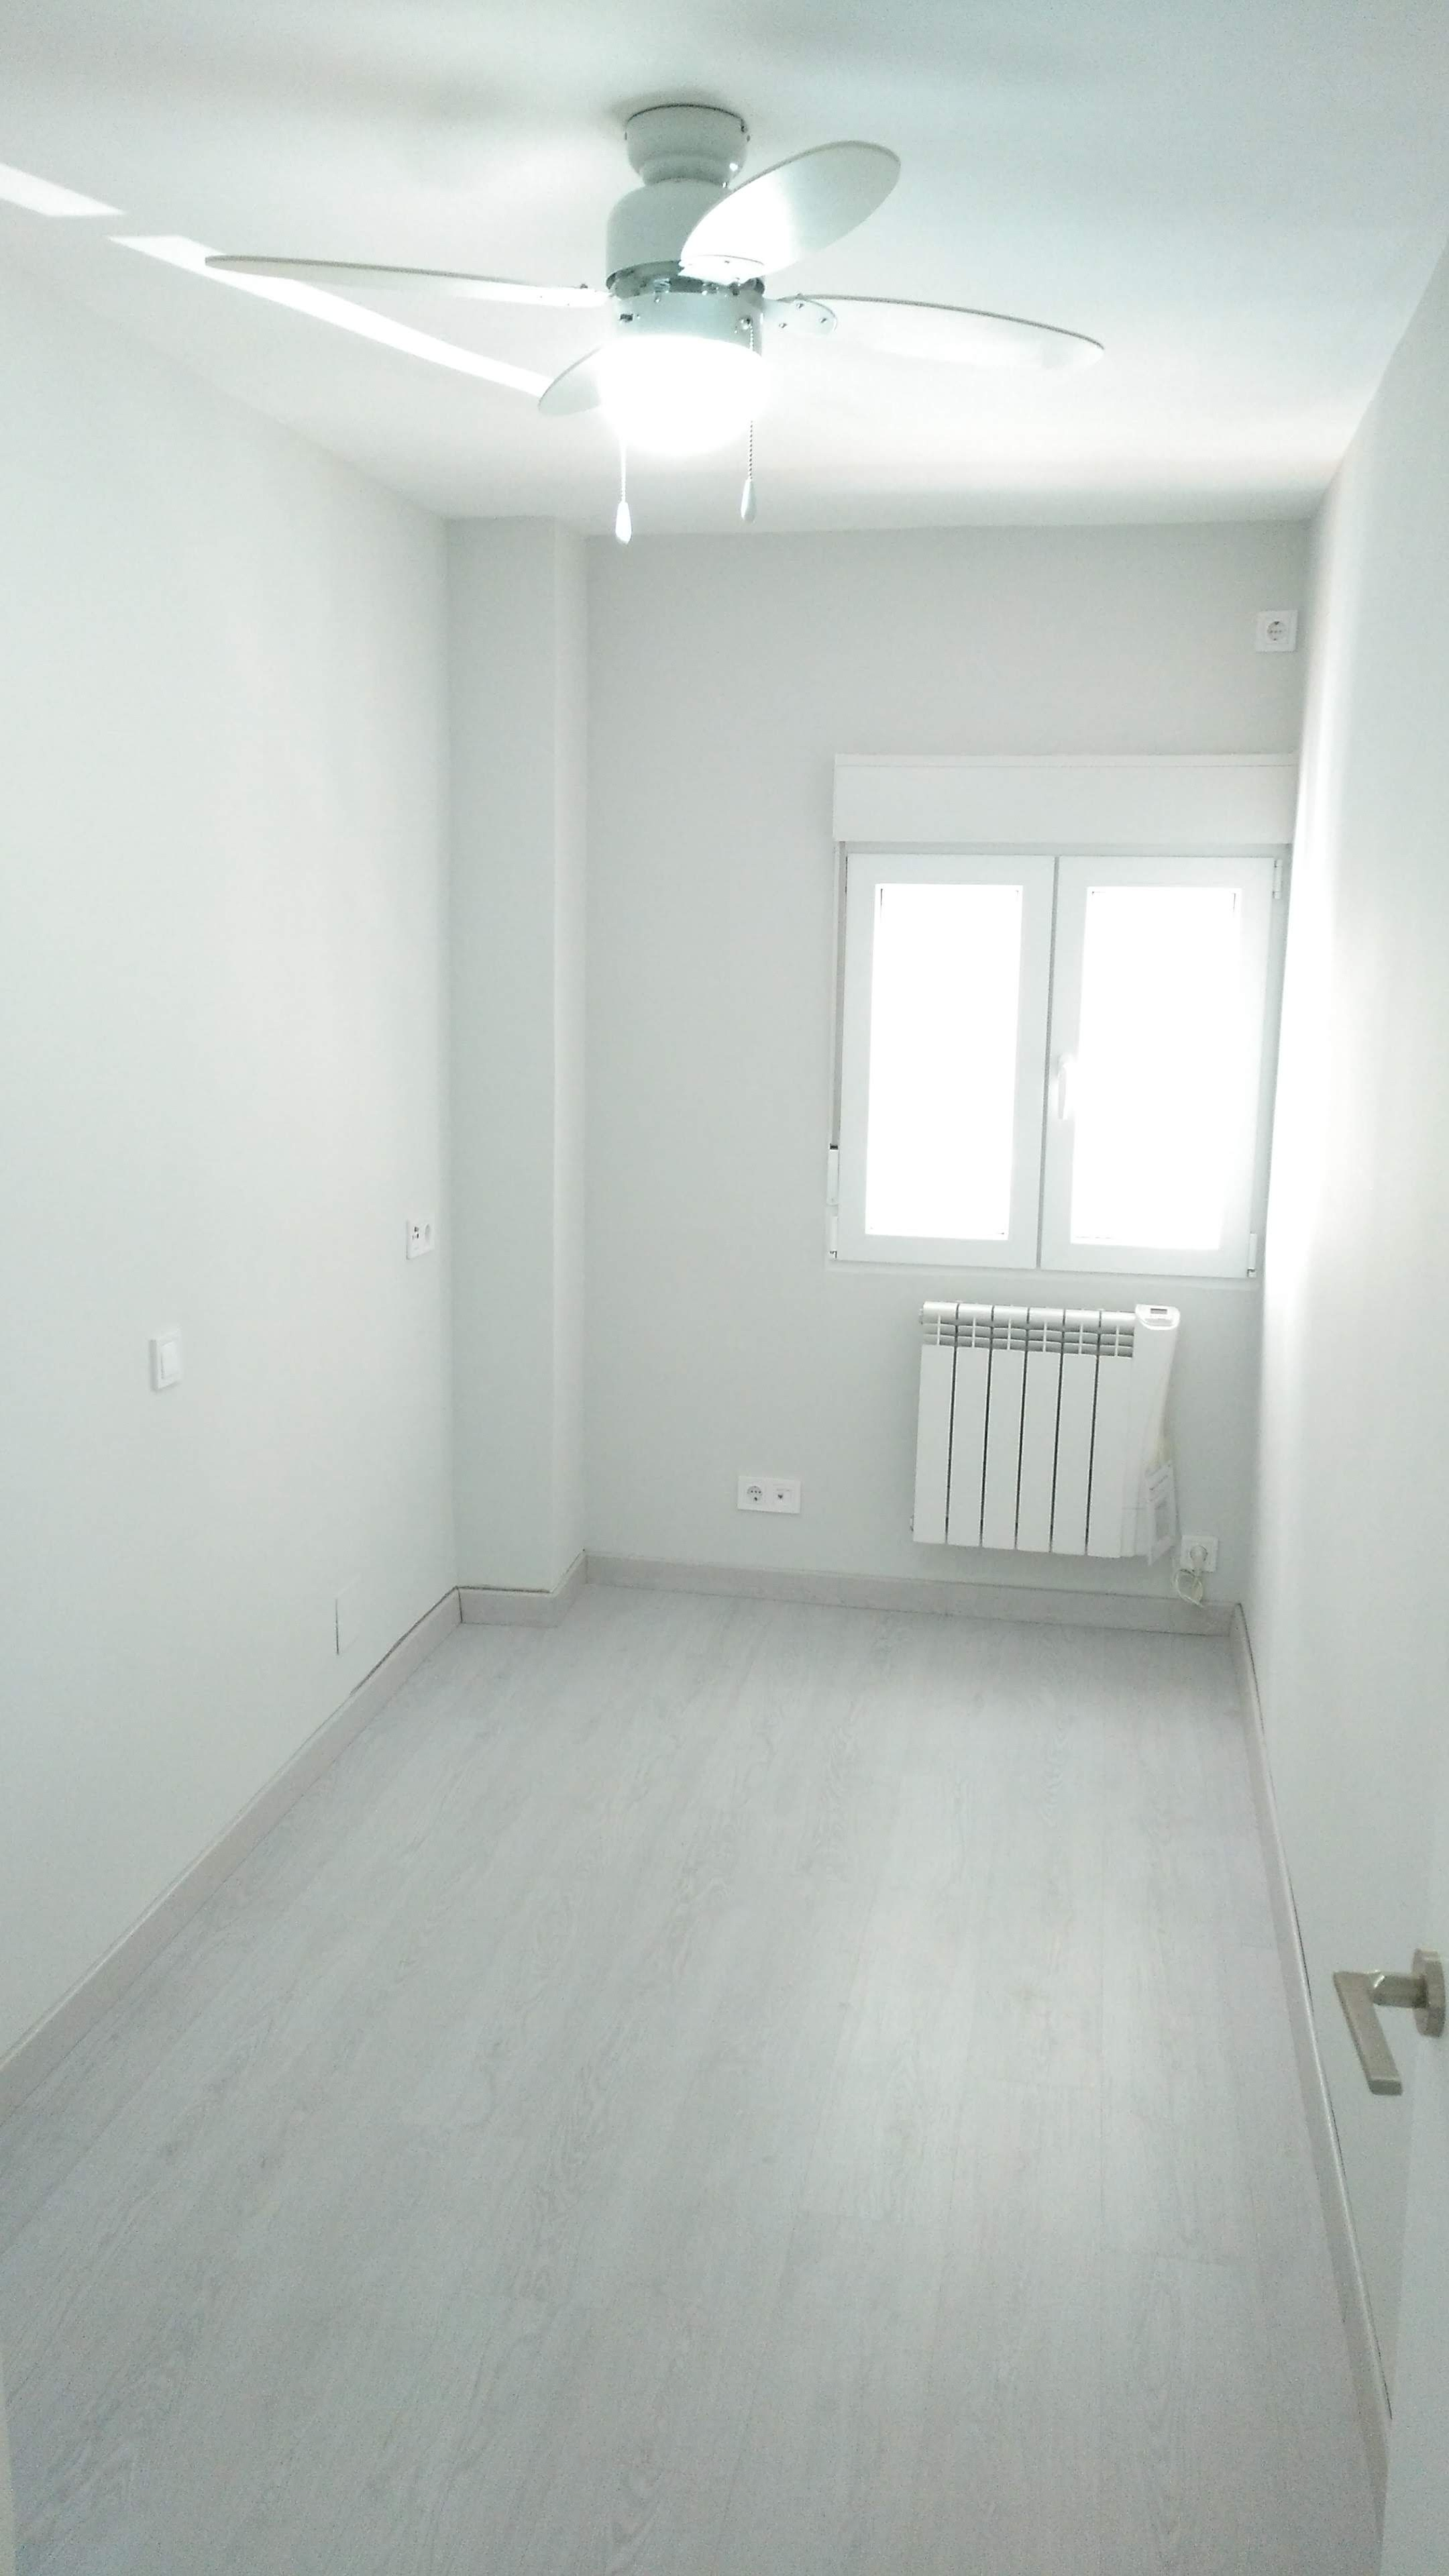 cuarto2_02.jpg